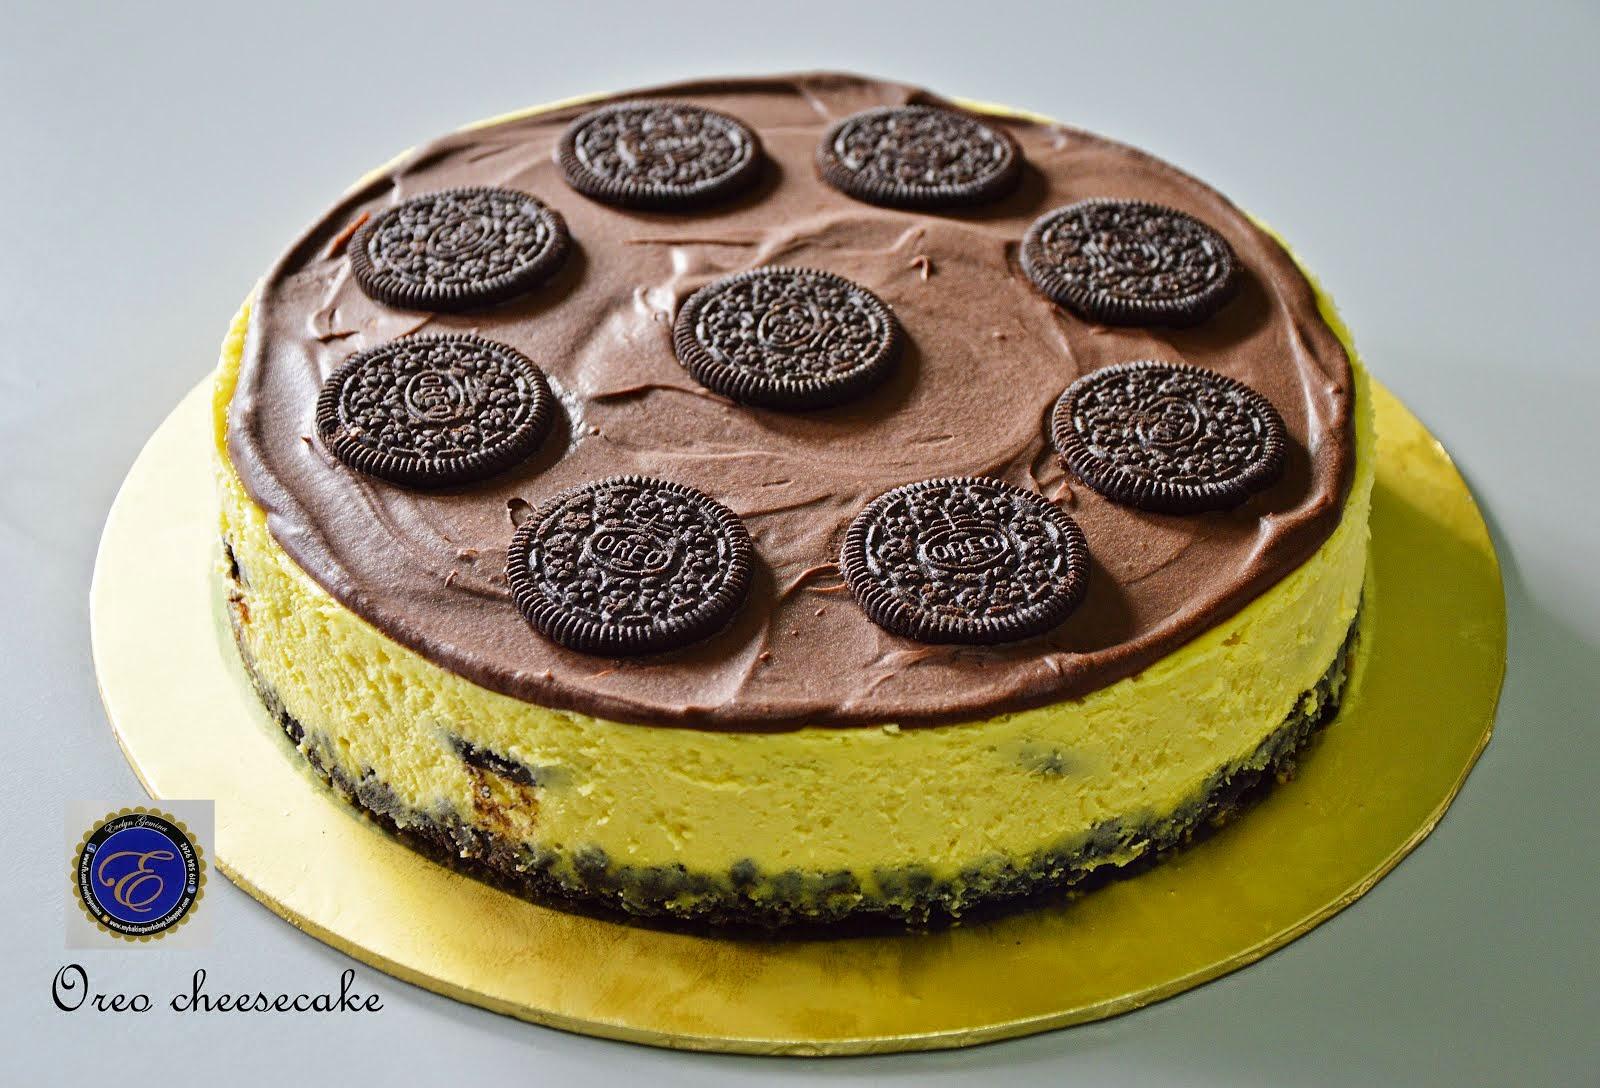 Oreo Cheesecake / 1.5kg